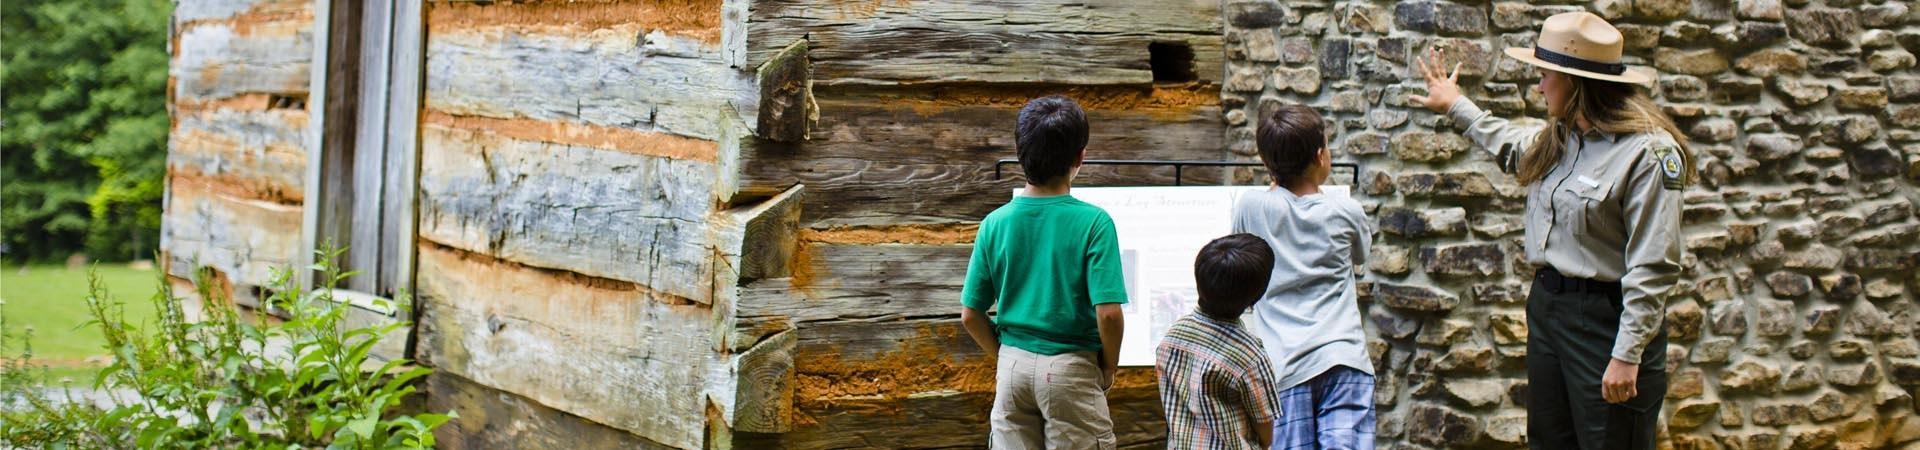 Fort Yargo Ranger gives kids a tour